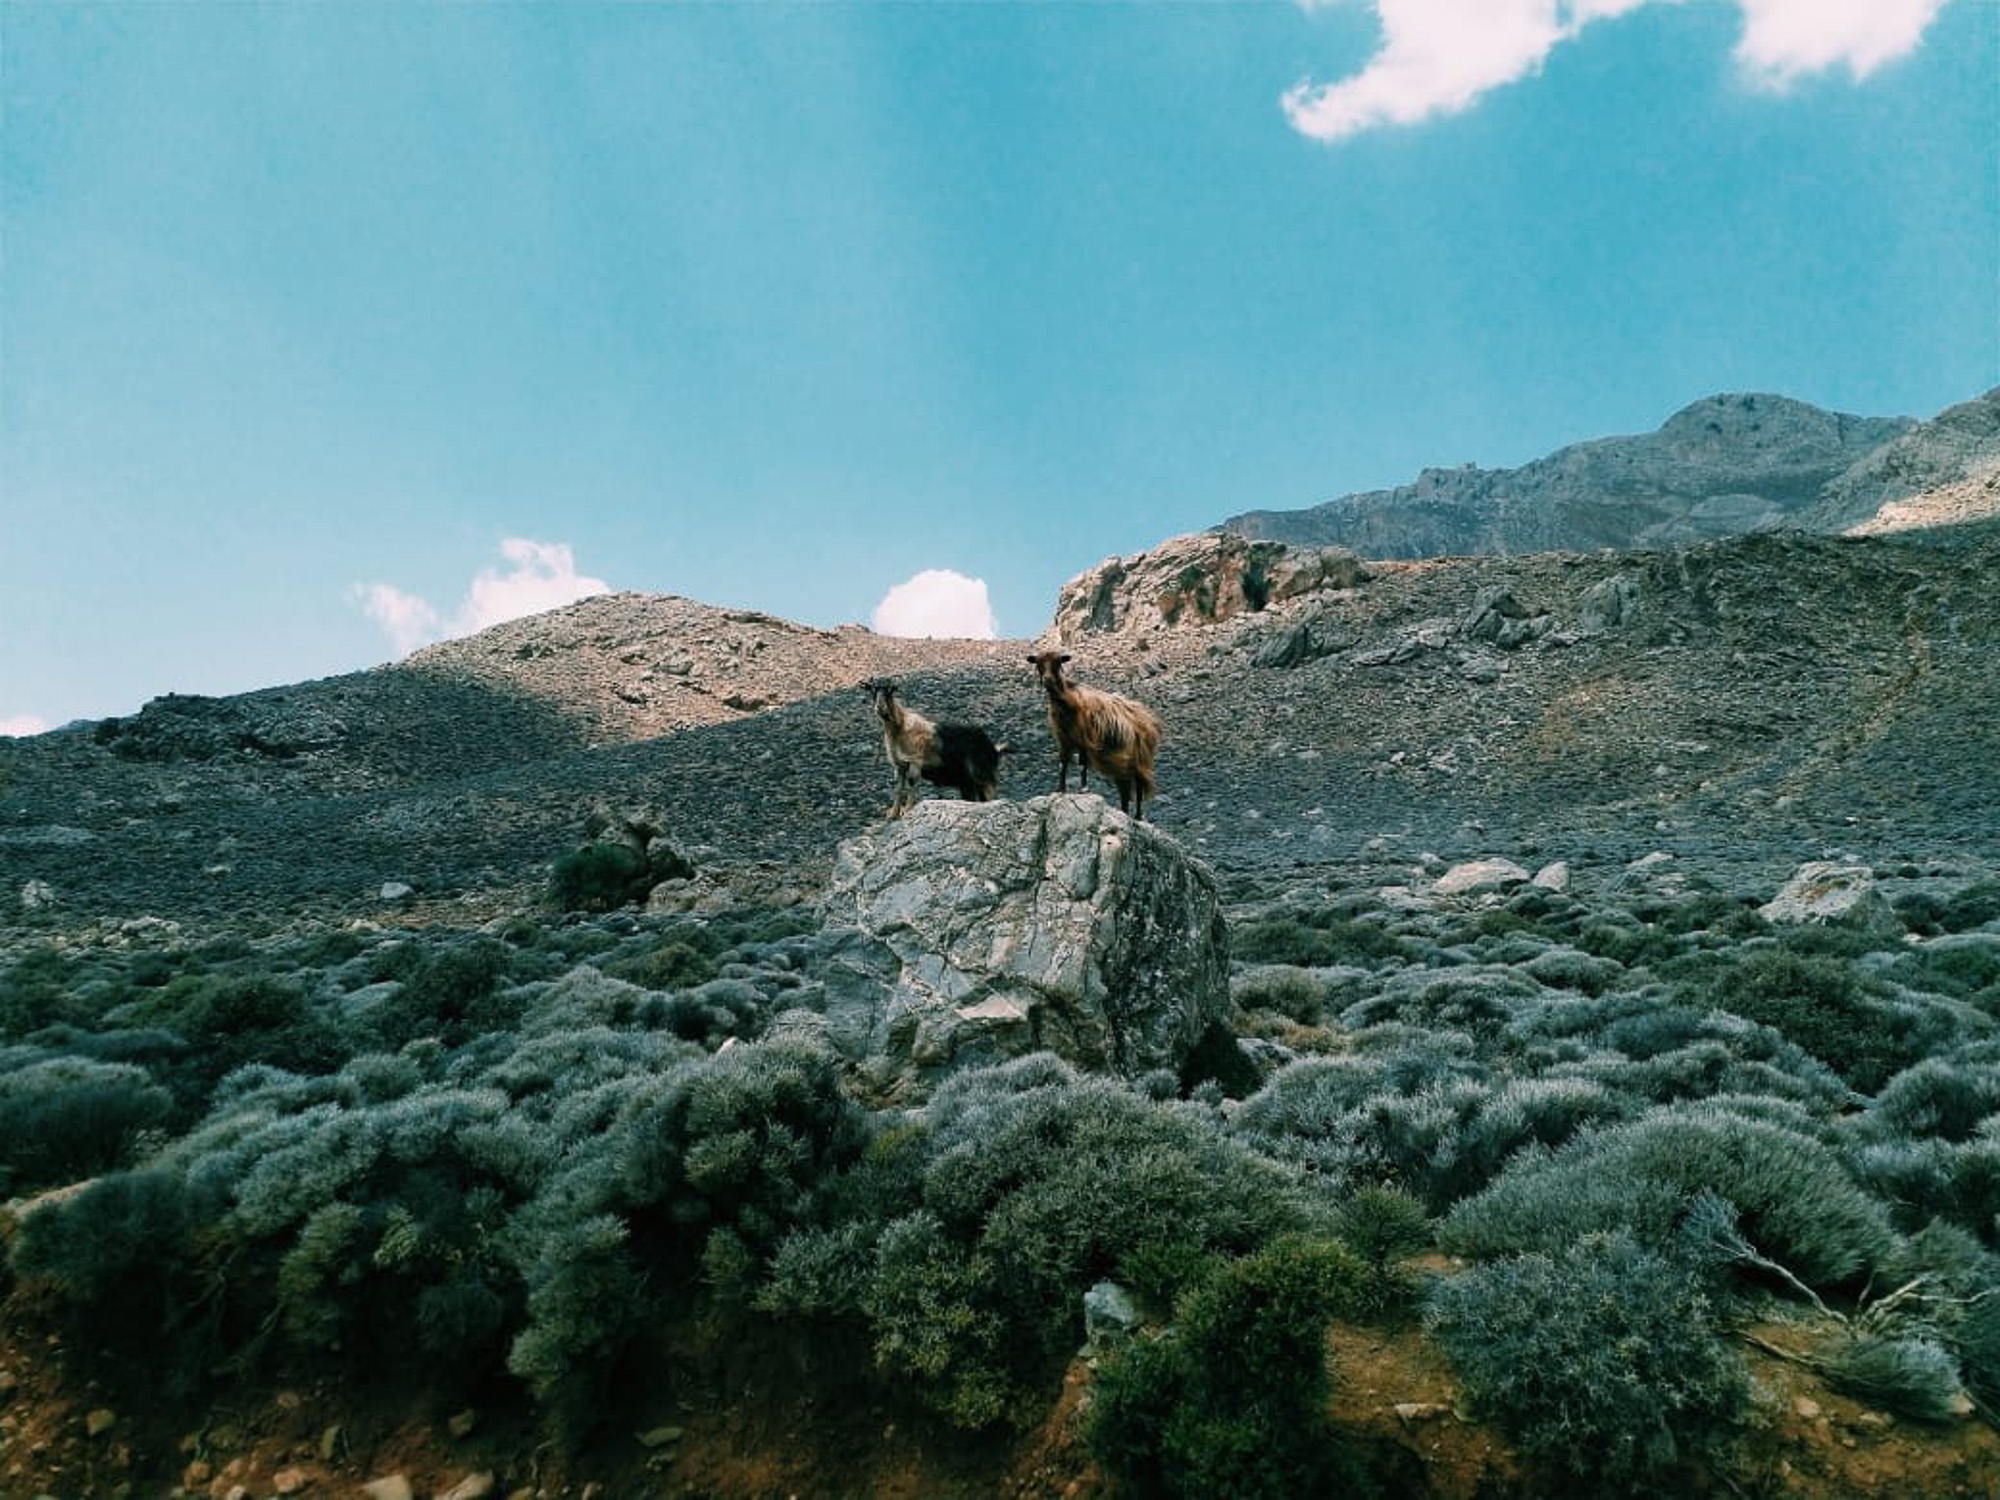 greek-shepherds-10-stemajourneys.com.jpg